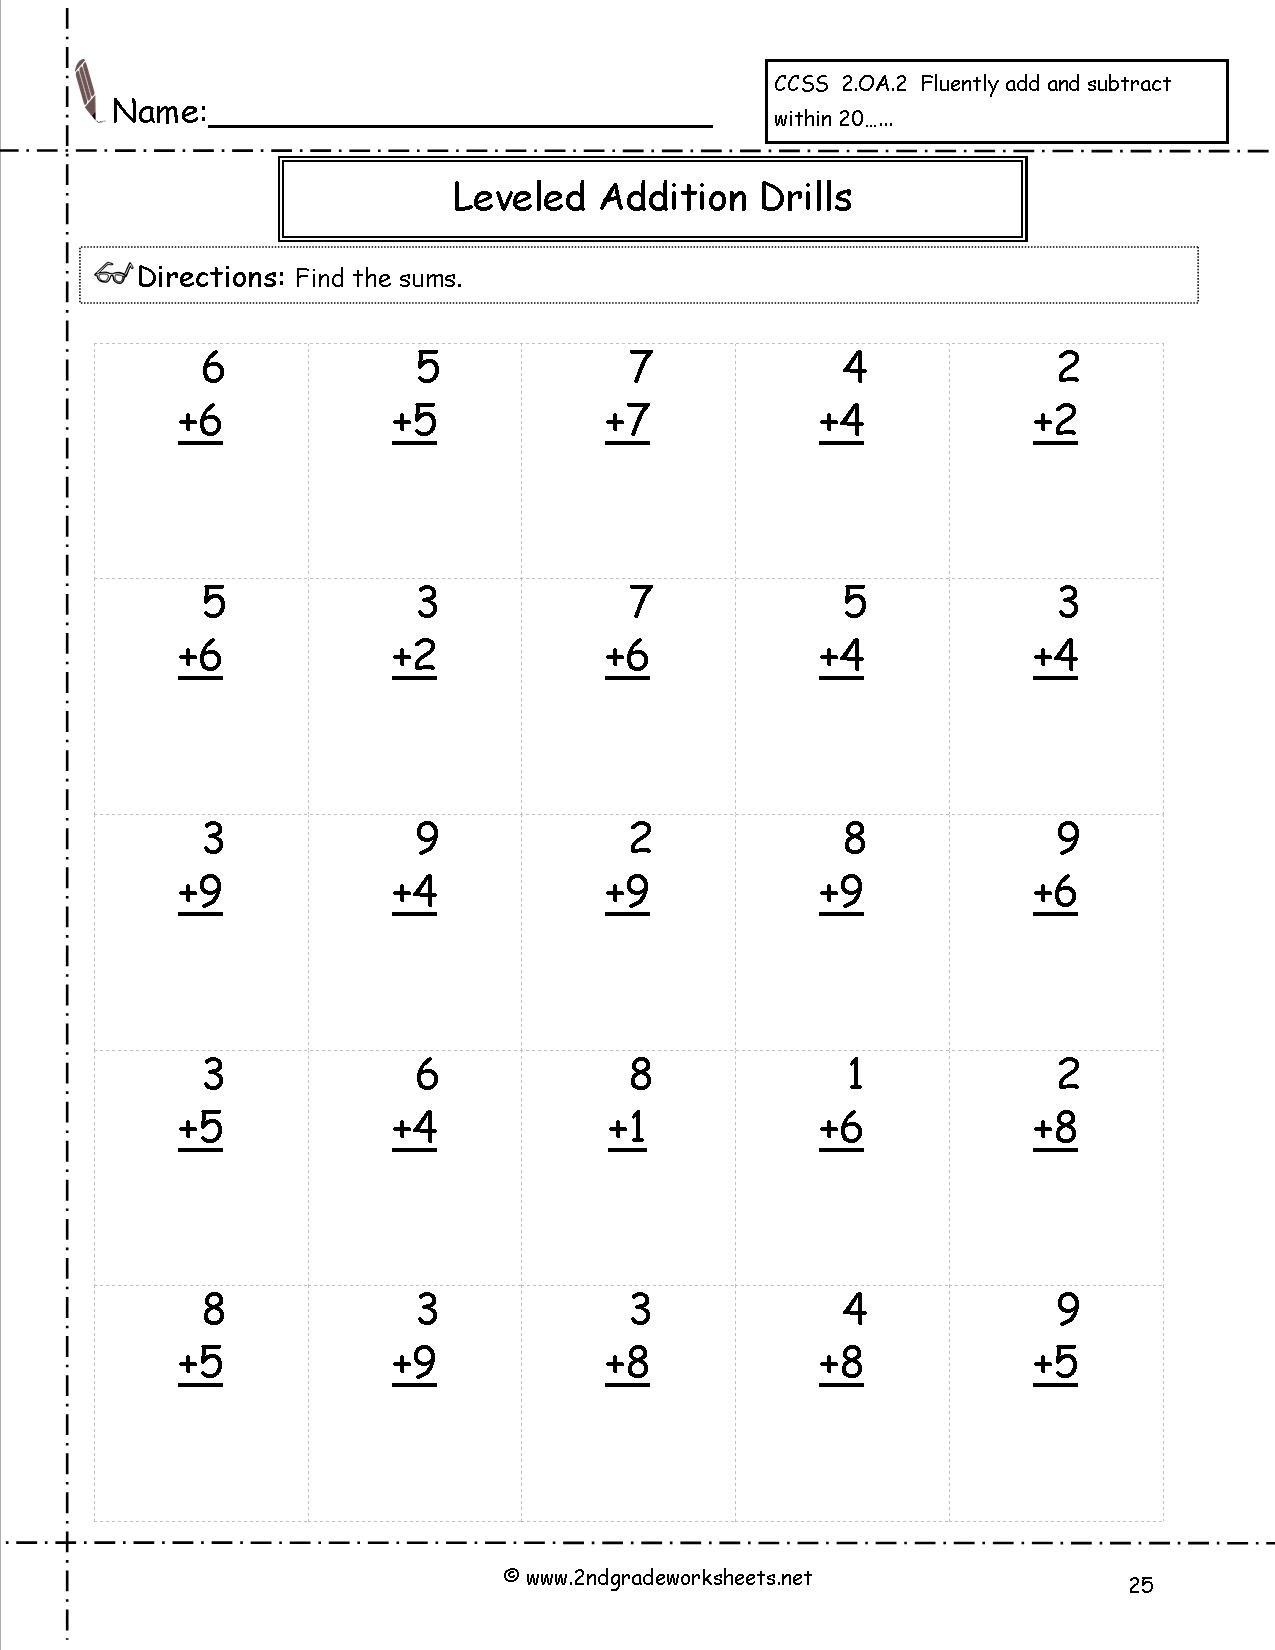 Free Math Worksheets And Printouts - Year 2 Free Printable Worksheets